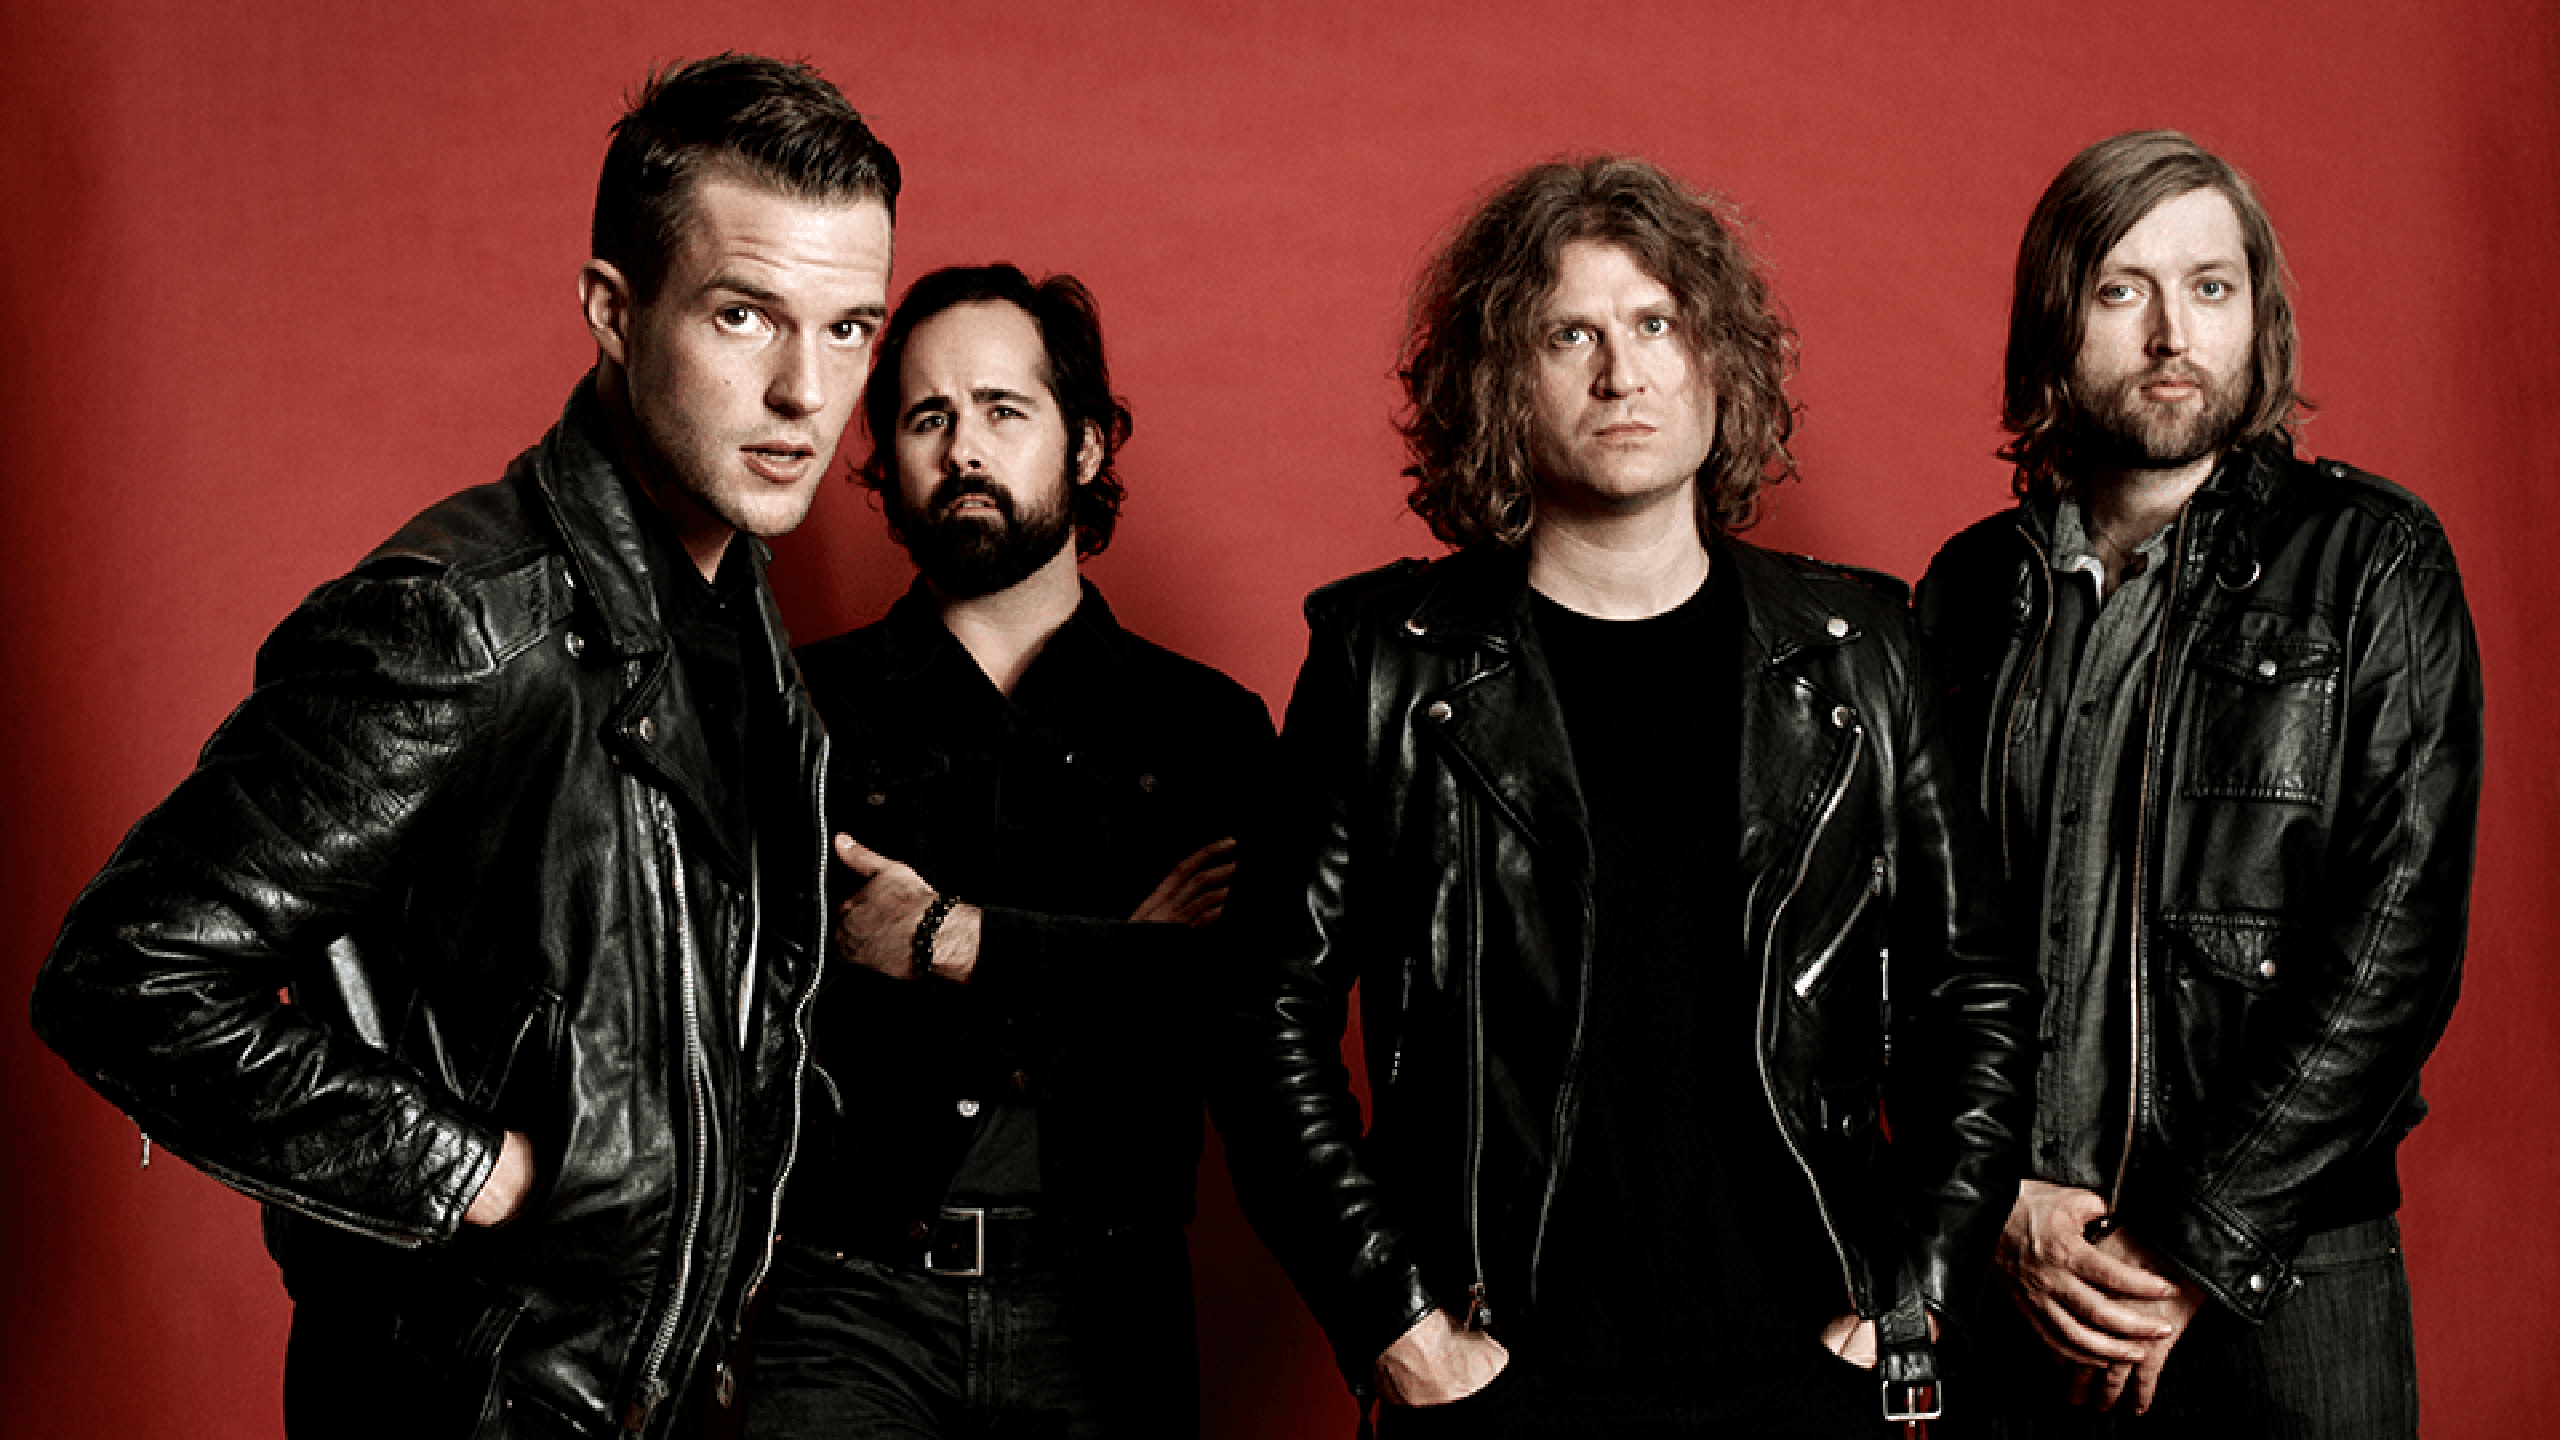 The Killers at Moda Center